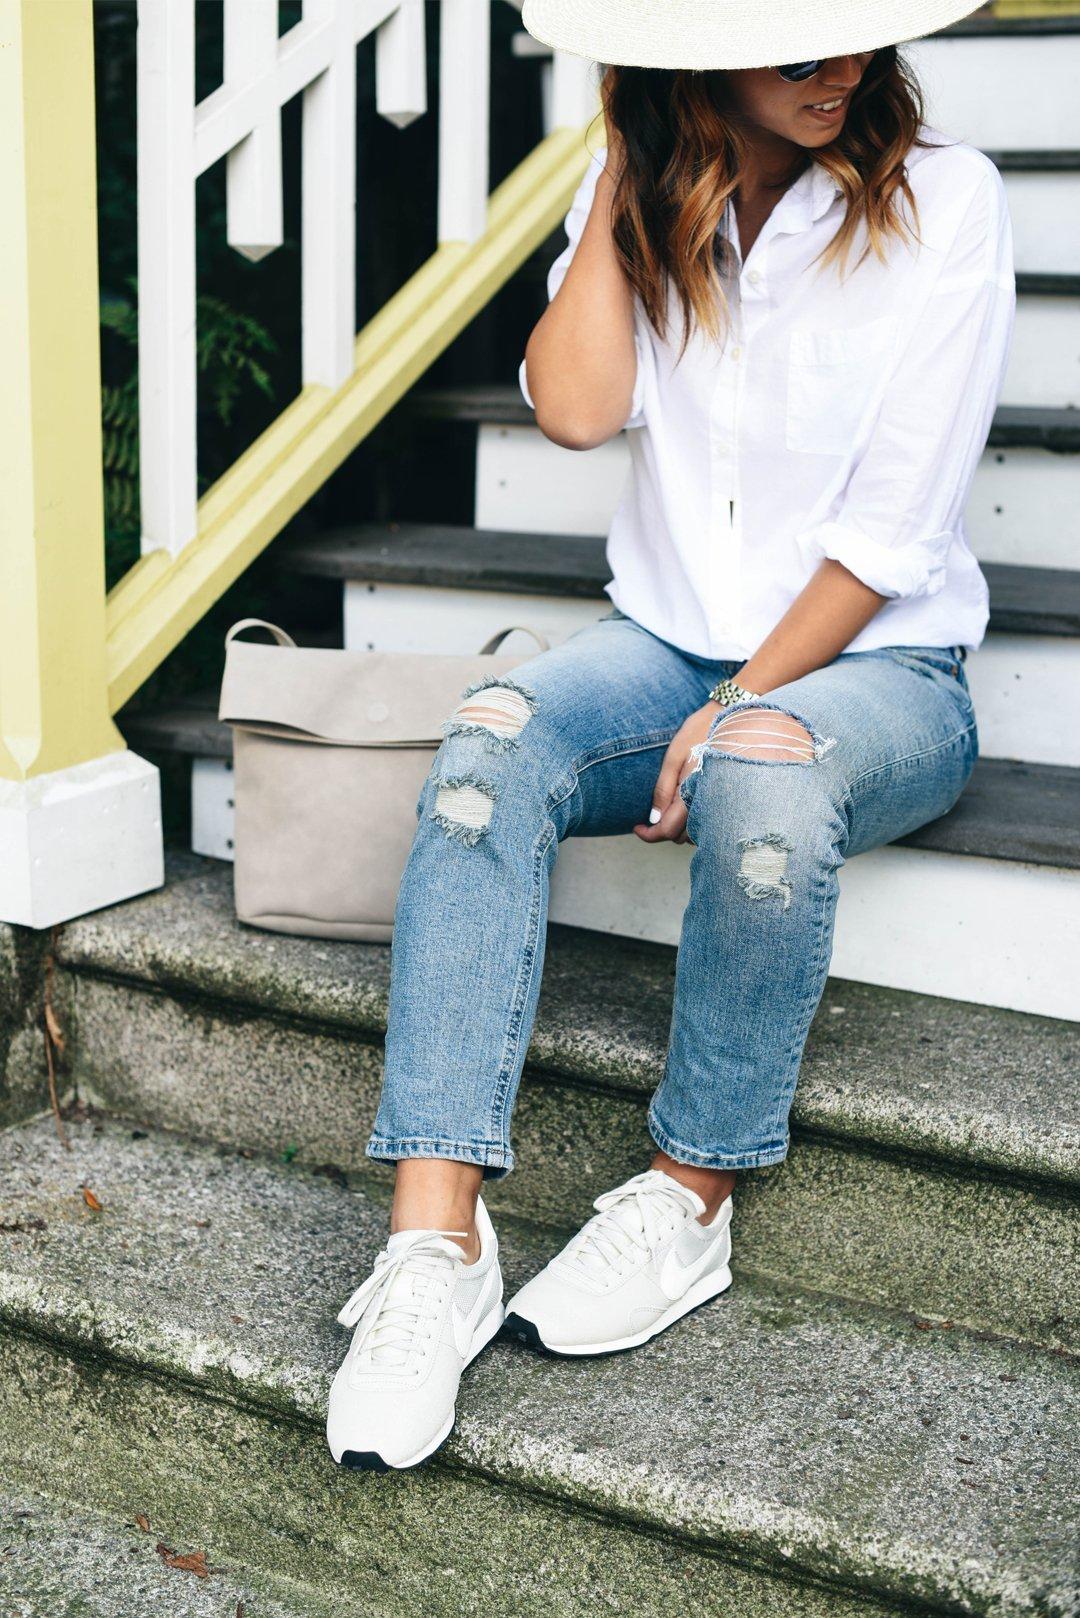 gray-nike-cortez-sneakers